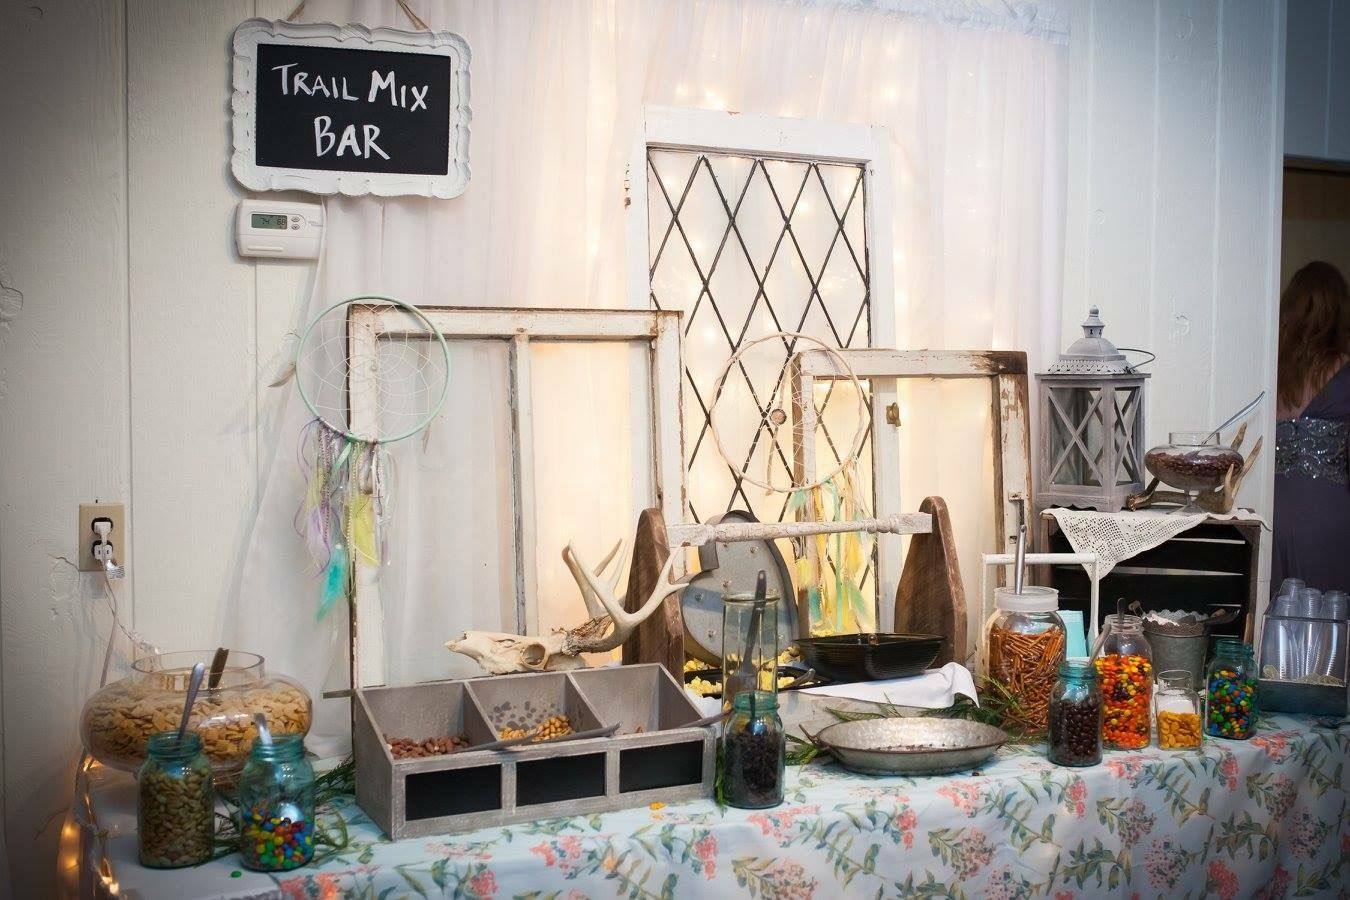 Trail Mix Bar, Wedding Favor | Mi Wildflower Weddings by Kendra ...